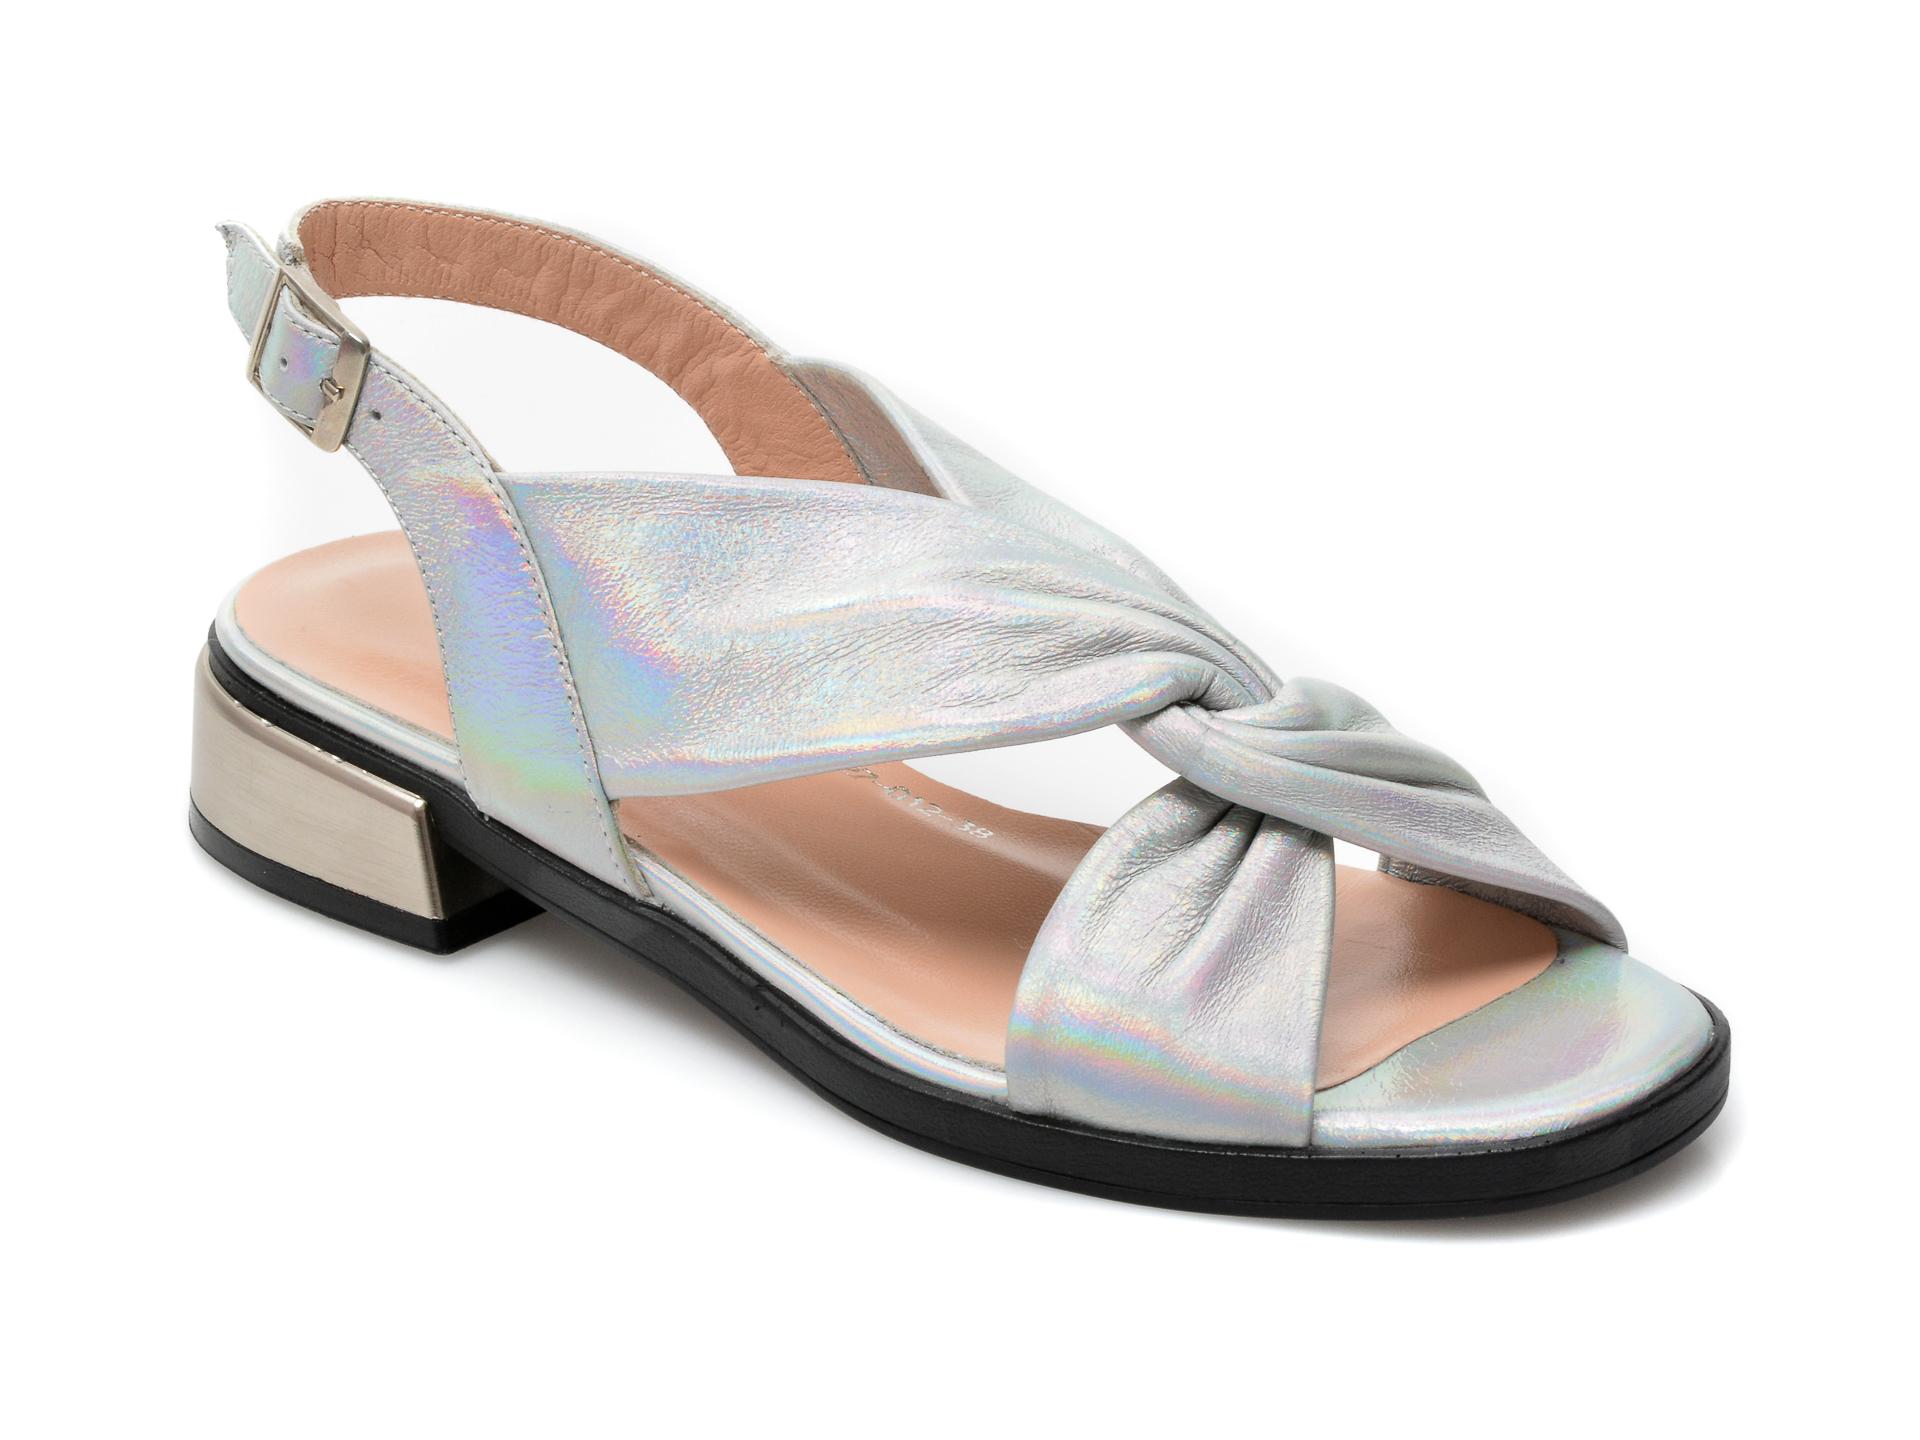 Sandale EPICA argintii, 193027, din piele naturala imagine otter.ro 2021